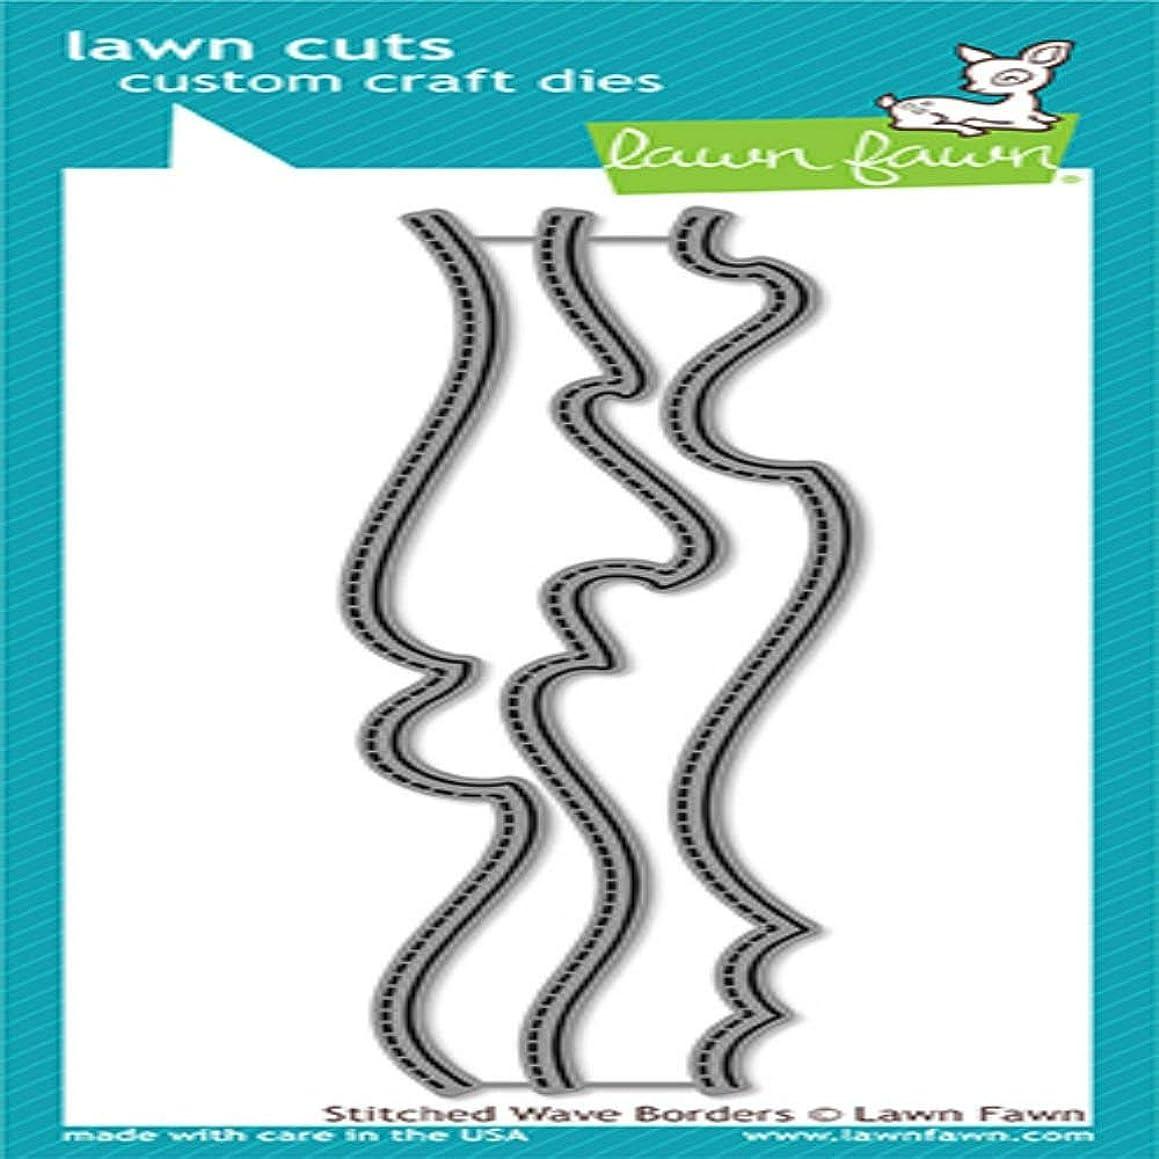 Lawn Fawn Lawn Cuts Custom Craft Die - LF1710 Stitched Wave Borders